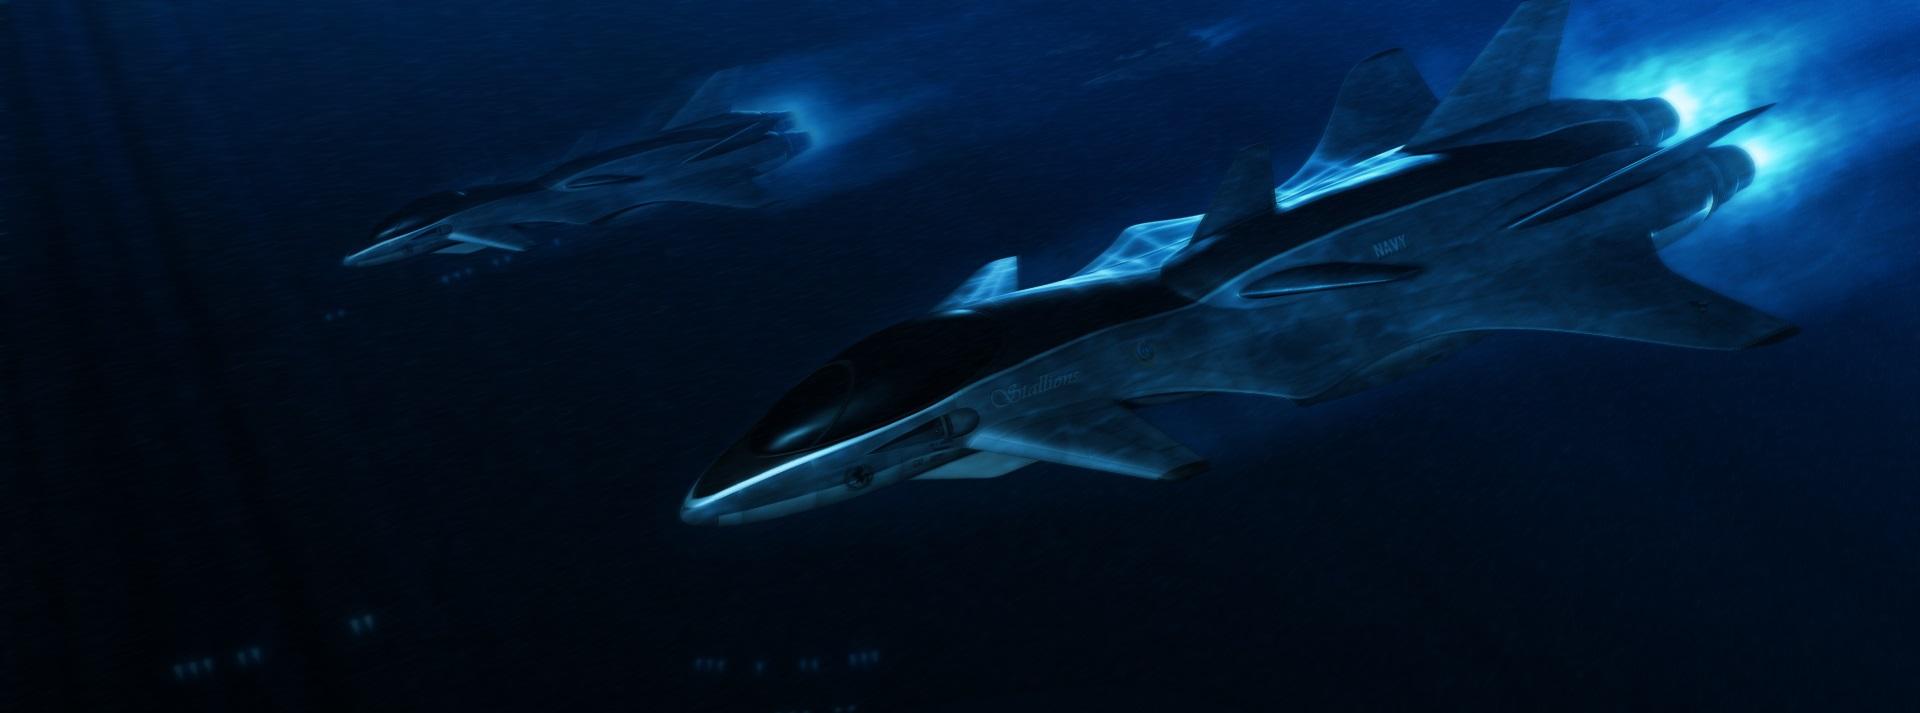 sci-fi ponorka